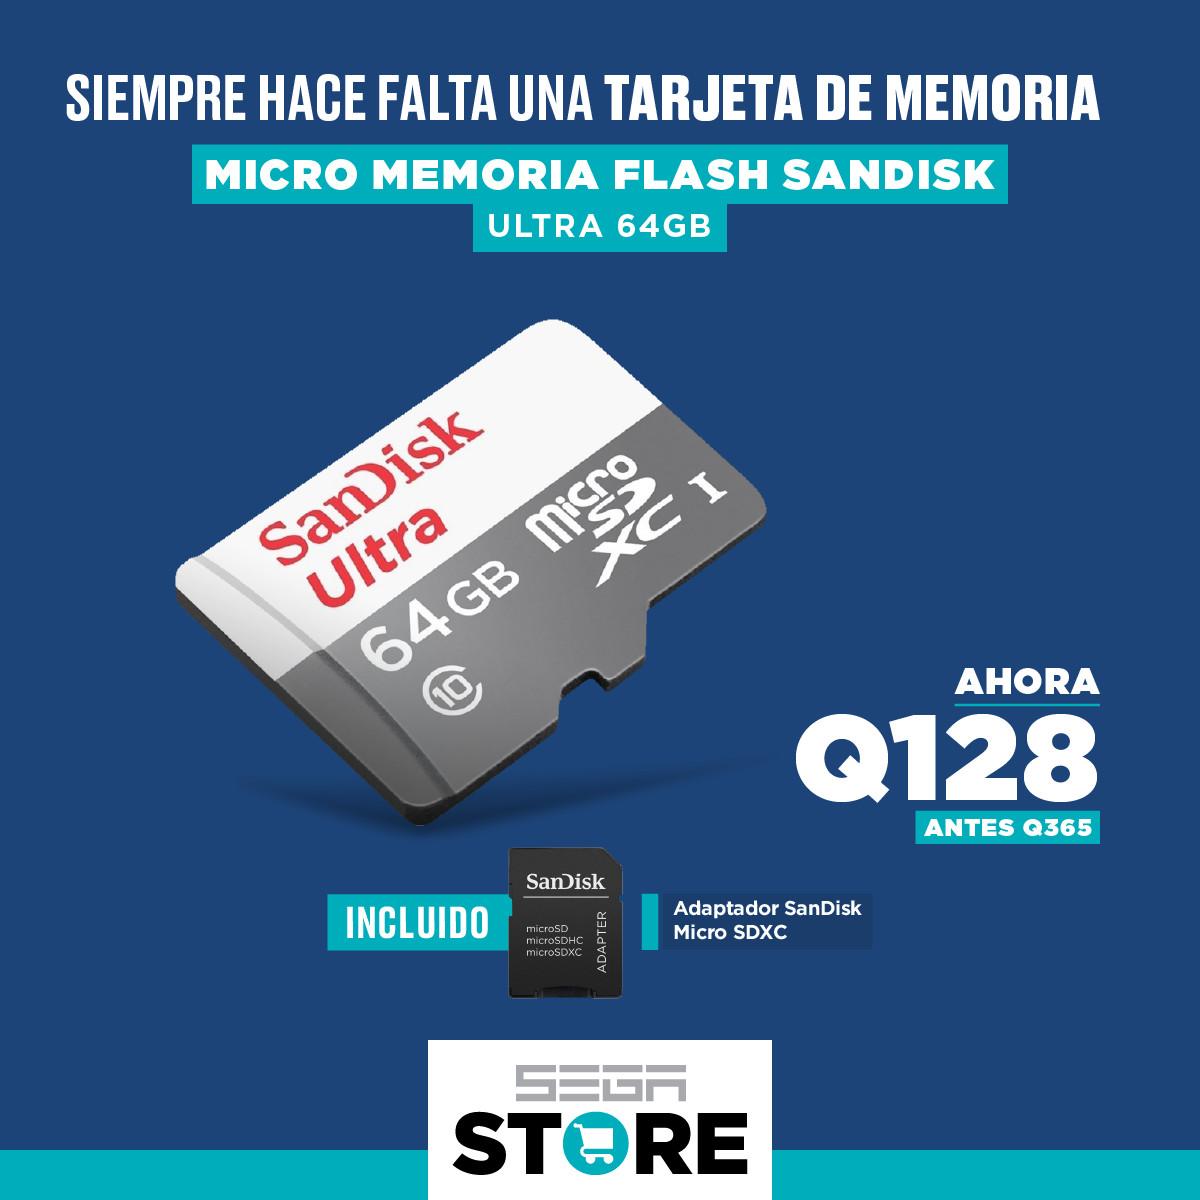 Oferta micro memoria SDXC Flash - SanDisk Ultra 64GB Class 10